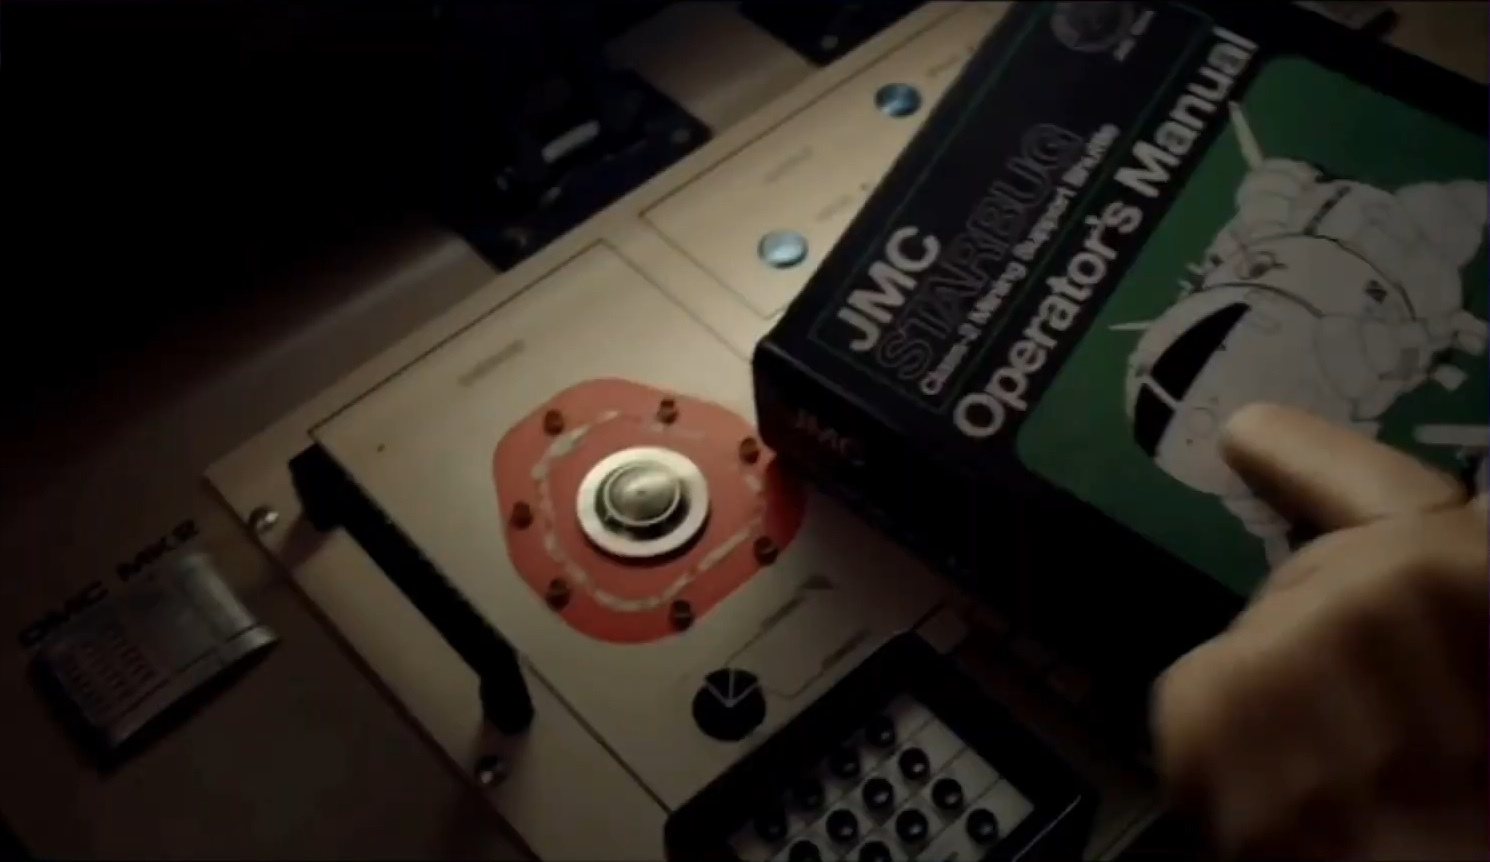 Starbug Operator's Manual